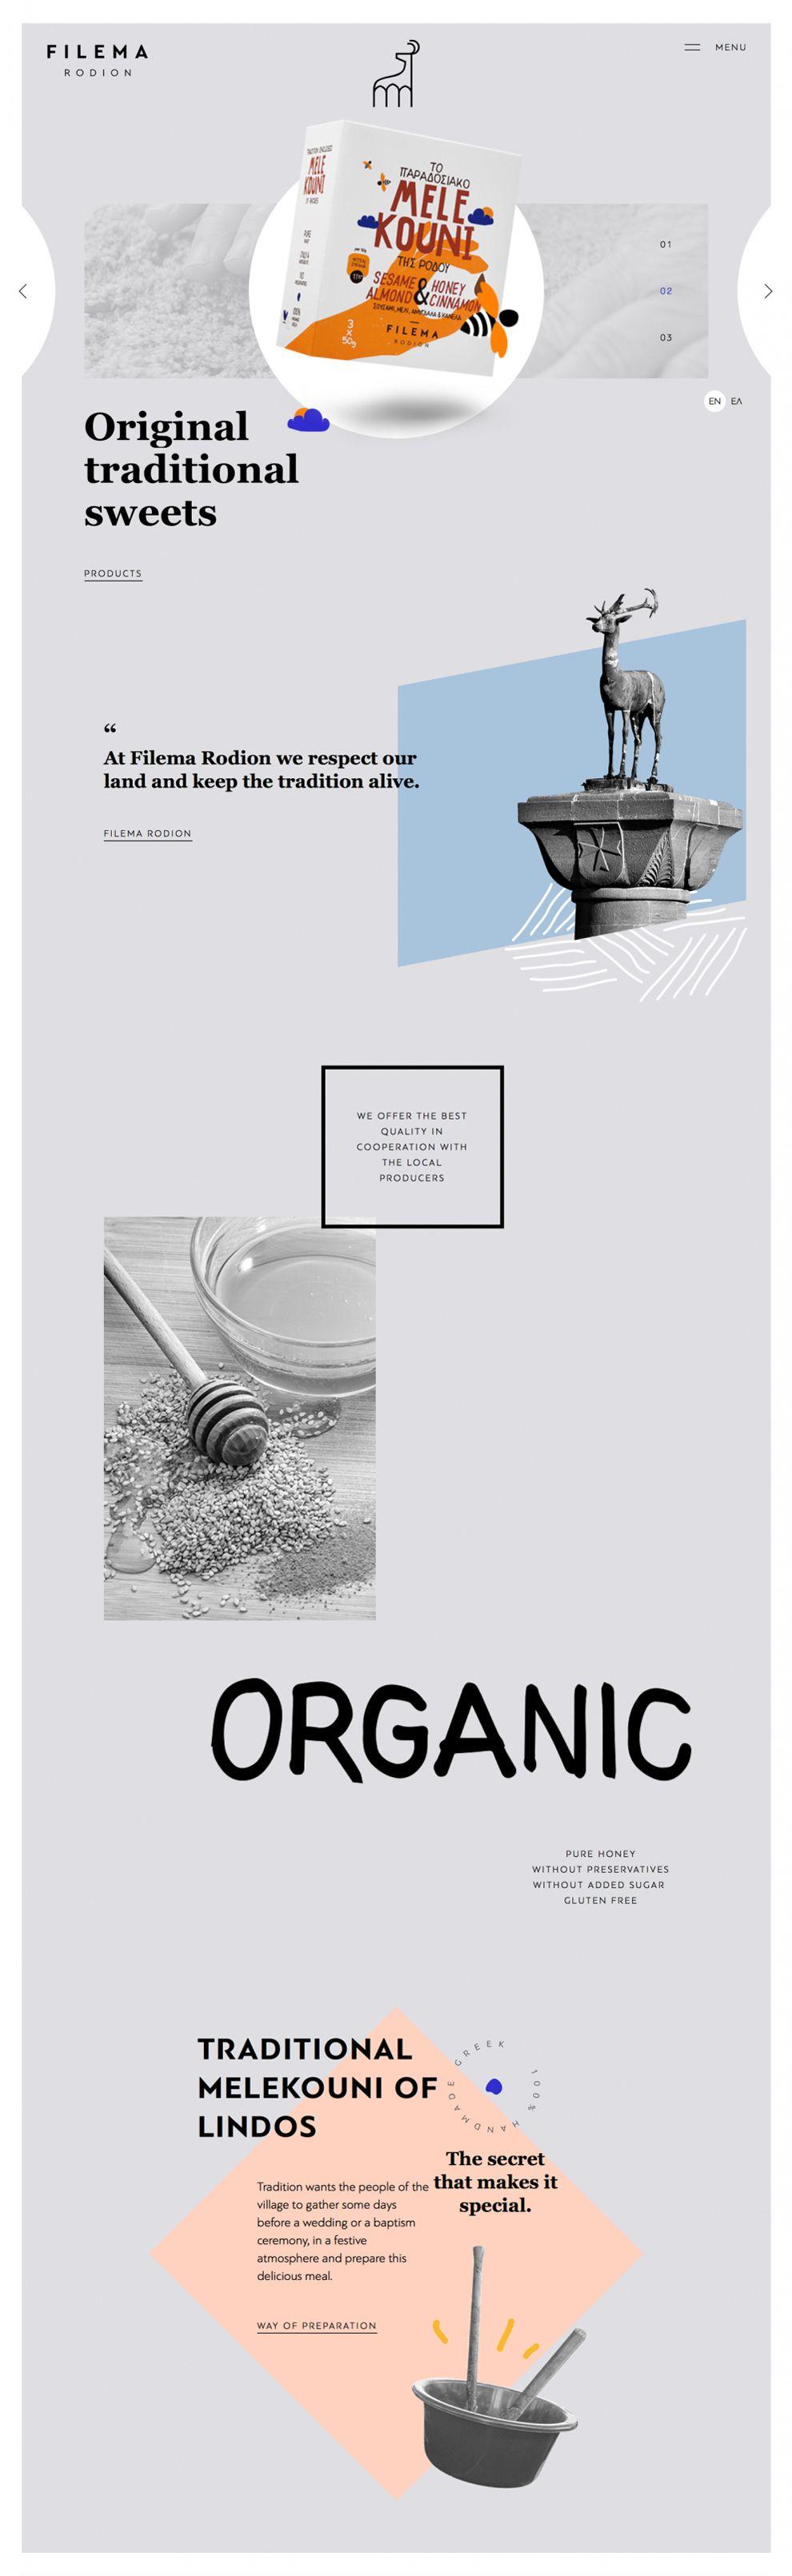 Filema Rodion Amazing Homepage